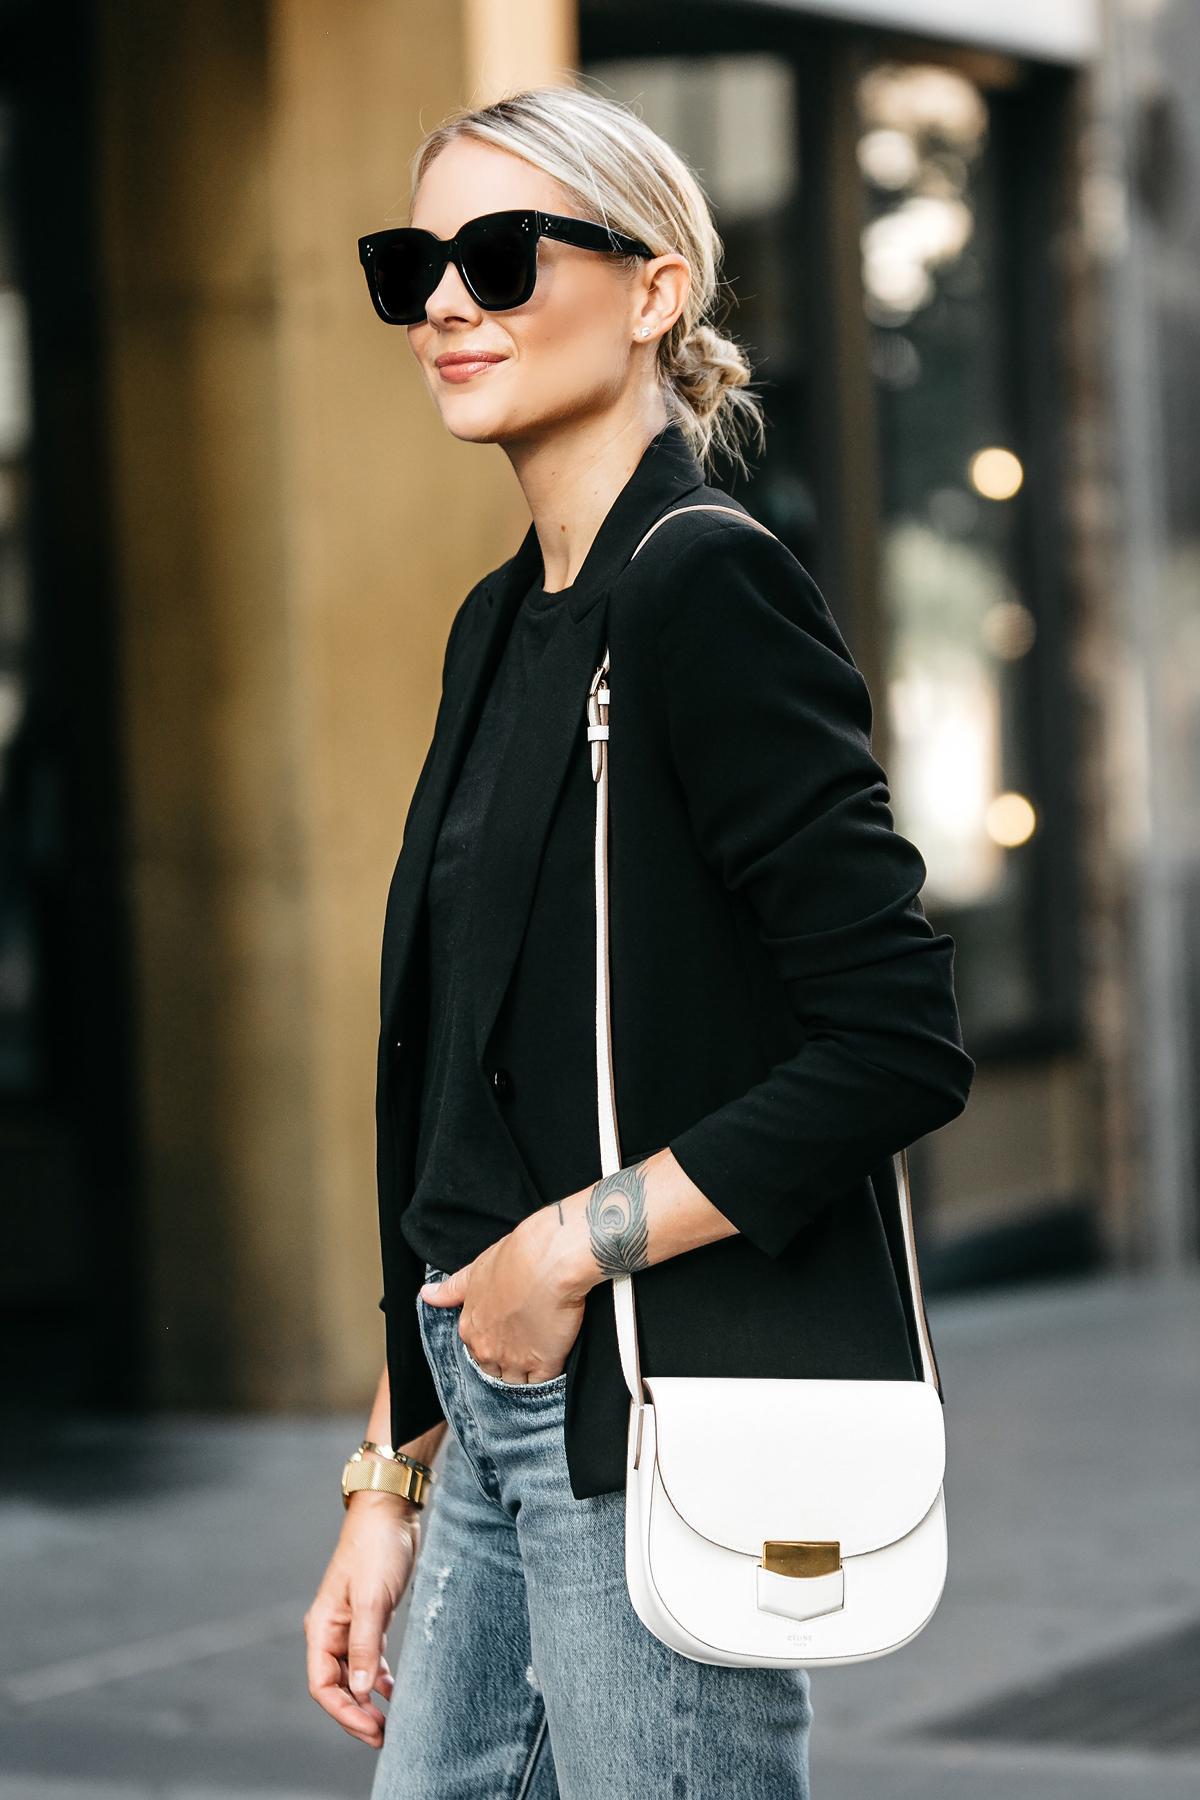 Blonde Woman Wearing Black Blazer Black Tshirt Denim Jeans Outfit Celine Trotteur White Handbag Fashion Jackson Dallas Blogger Fashion Blogger Street Style